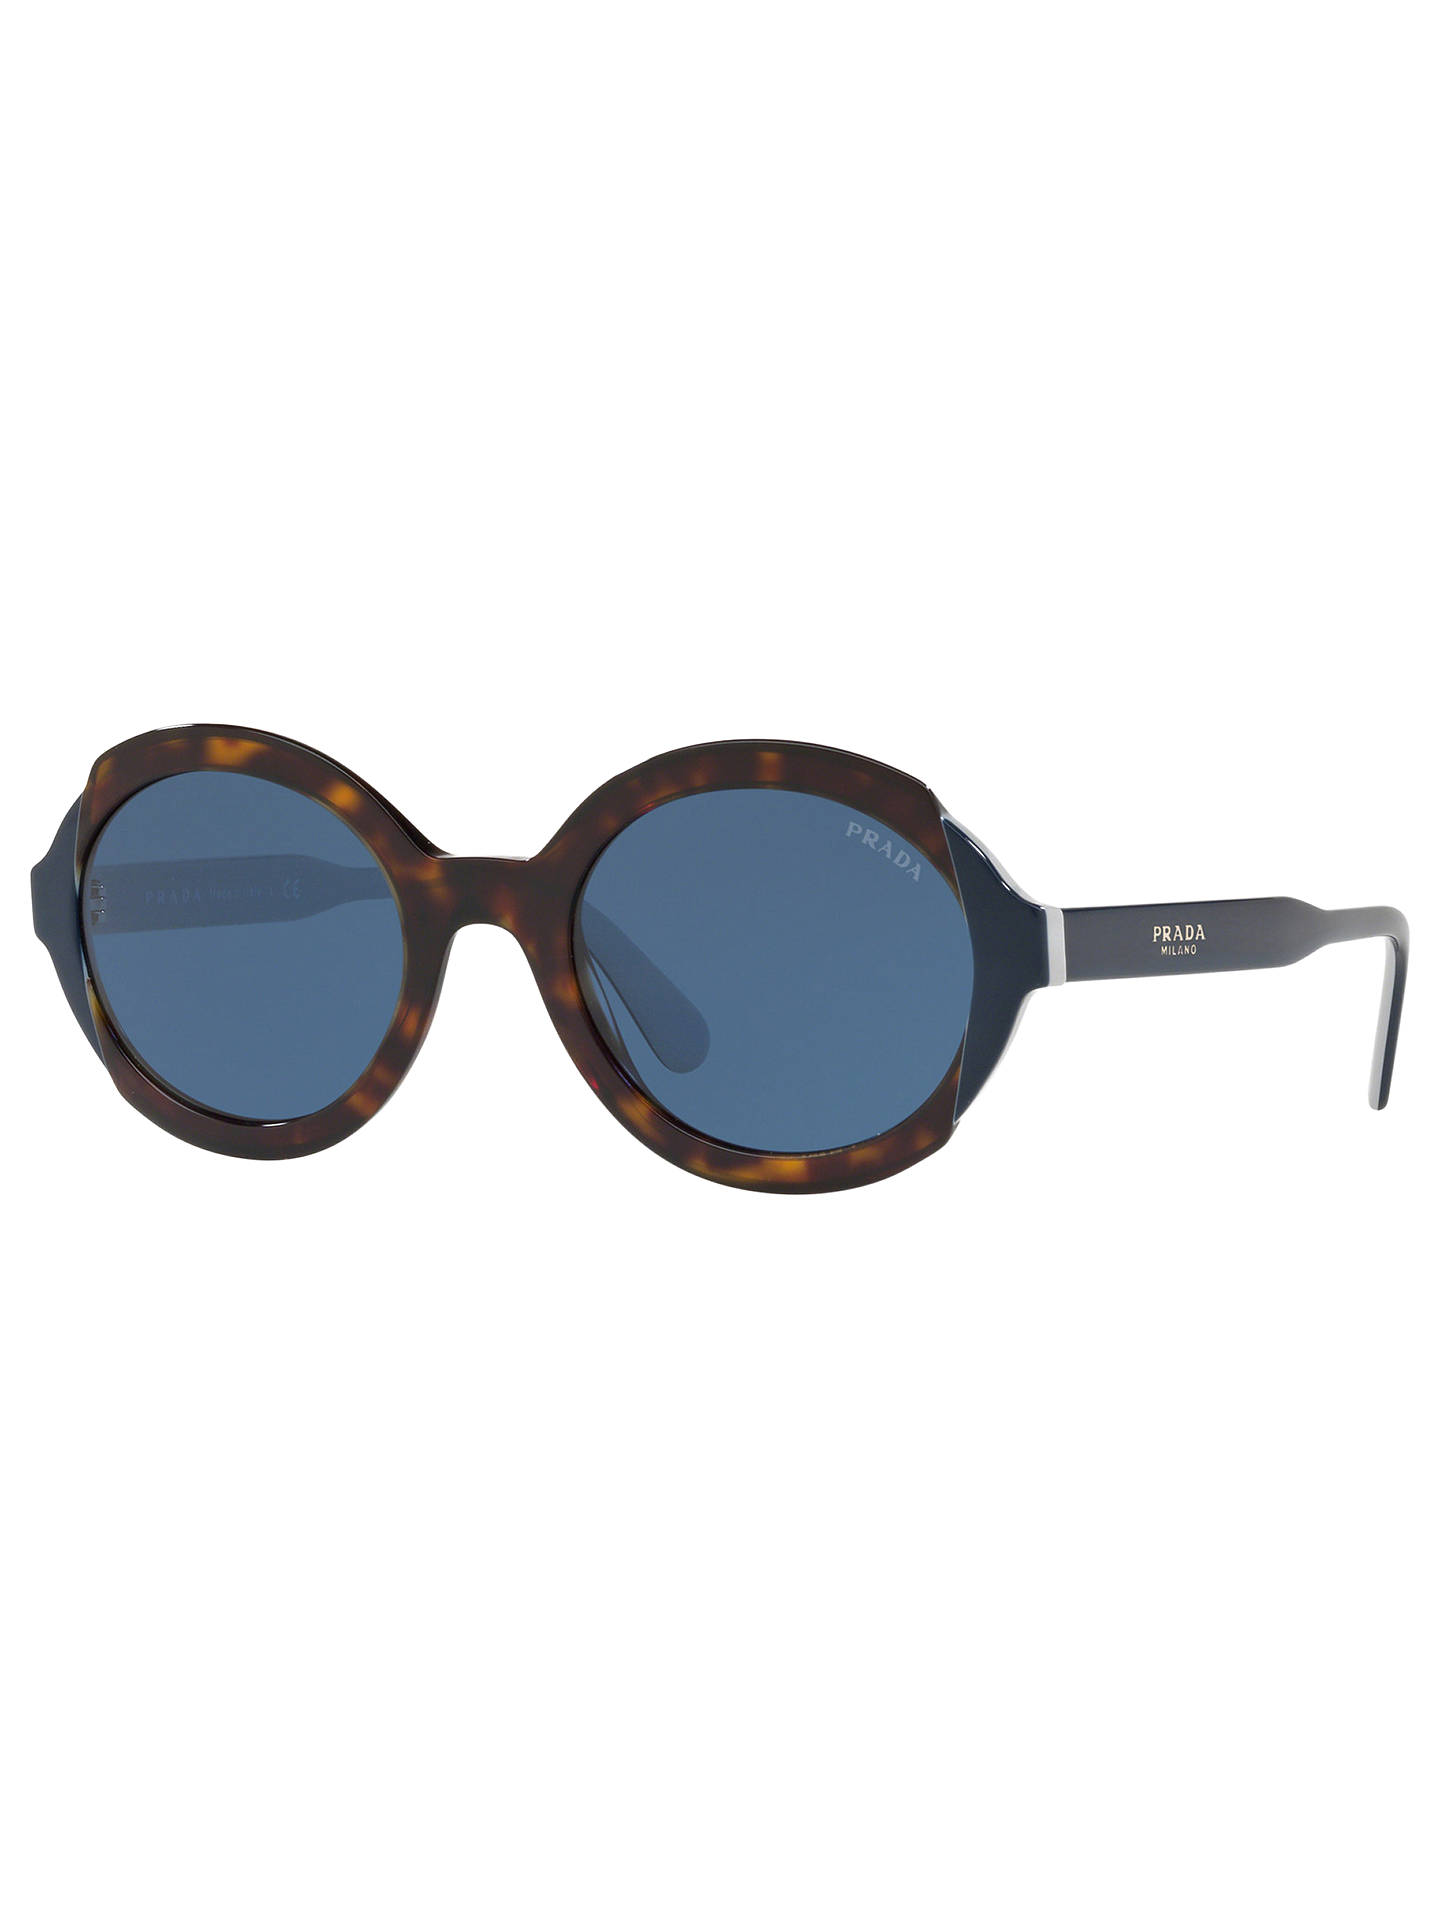 4e4bd81b1b940 Prada 17US Women s Oval Sunglasses at John Lewis   Partners